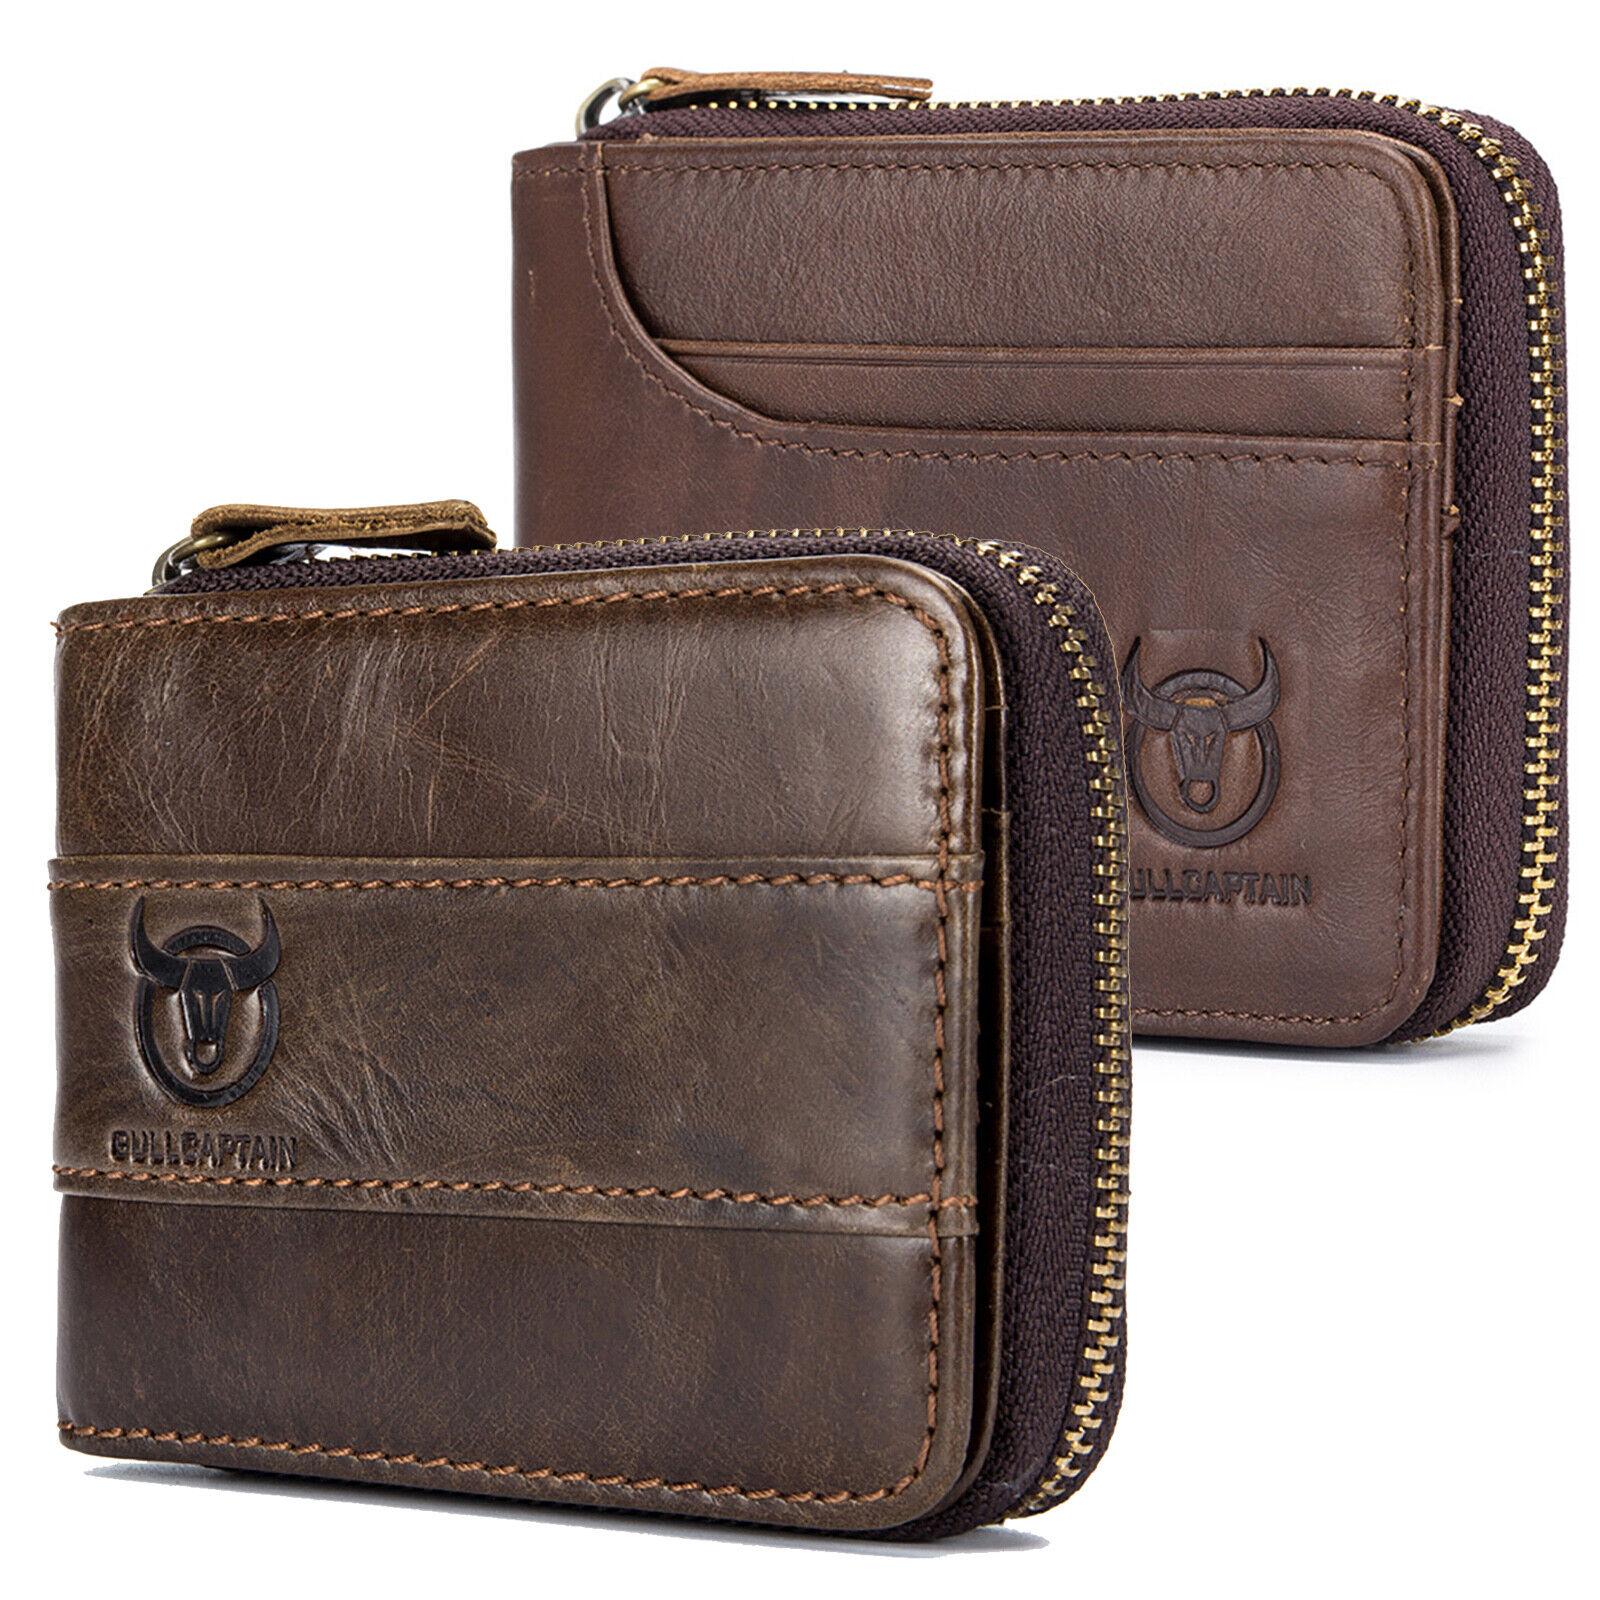 Mens Wallet Genuine Leather RFID Zipper Around Bifold with Coin Pocket Handmade